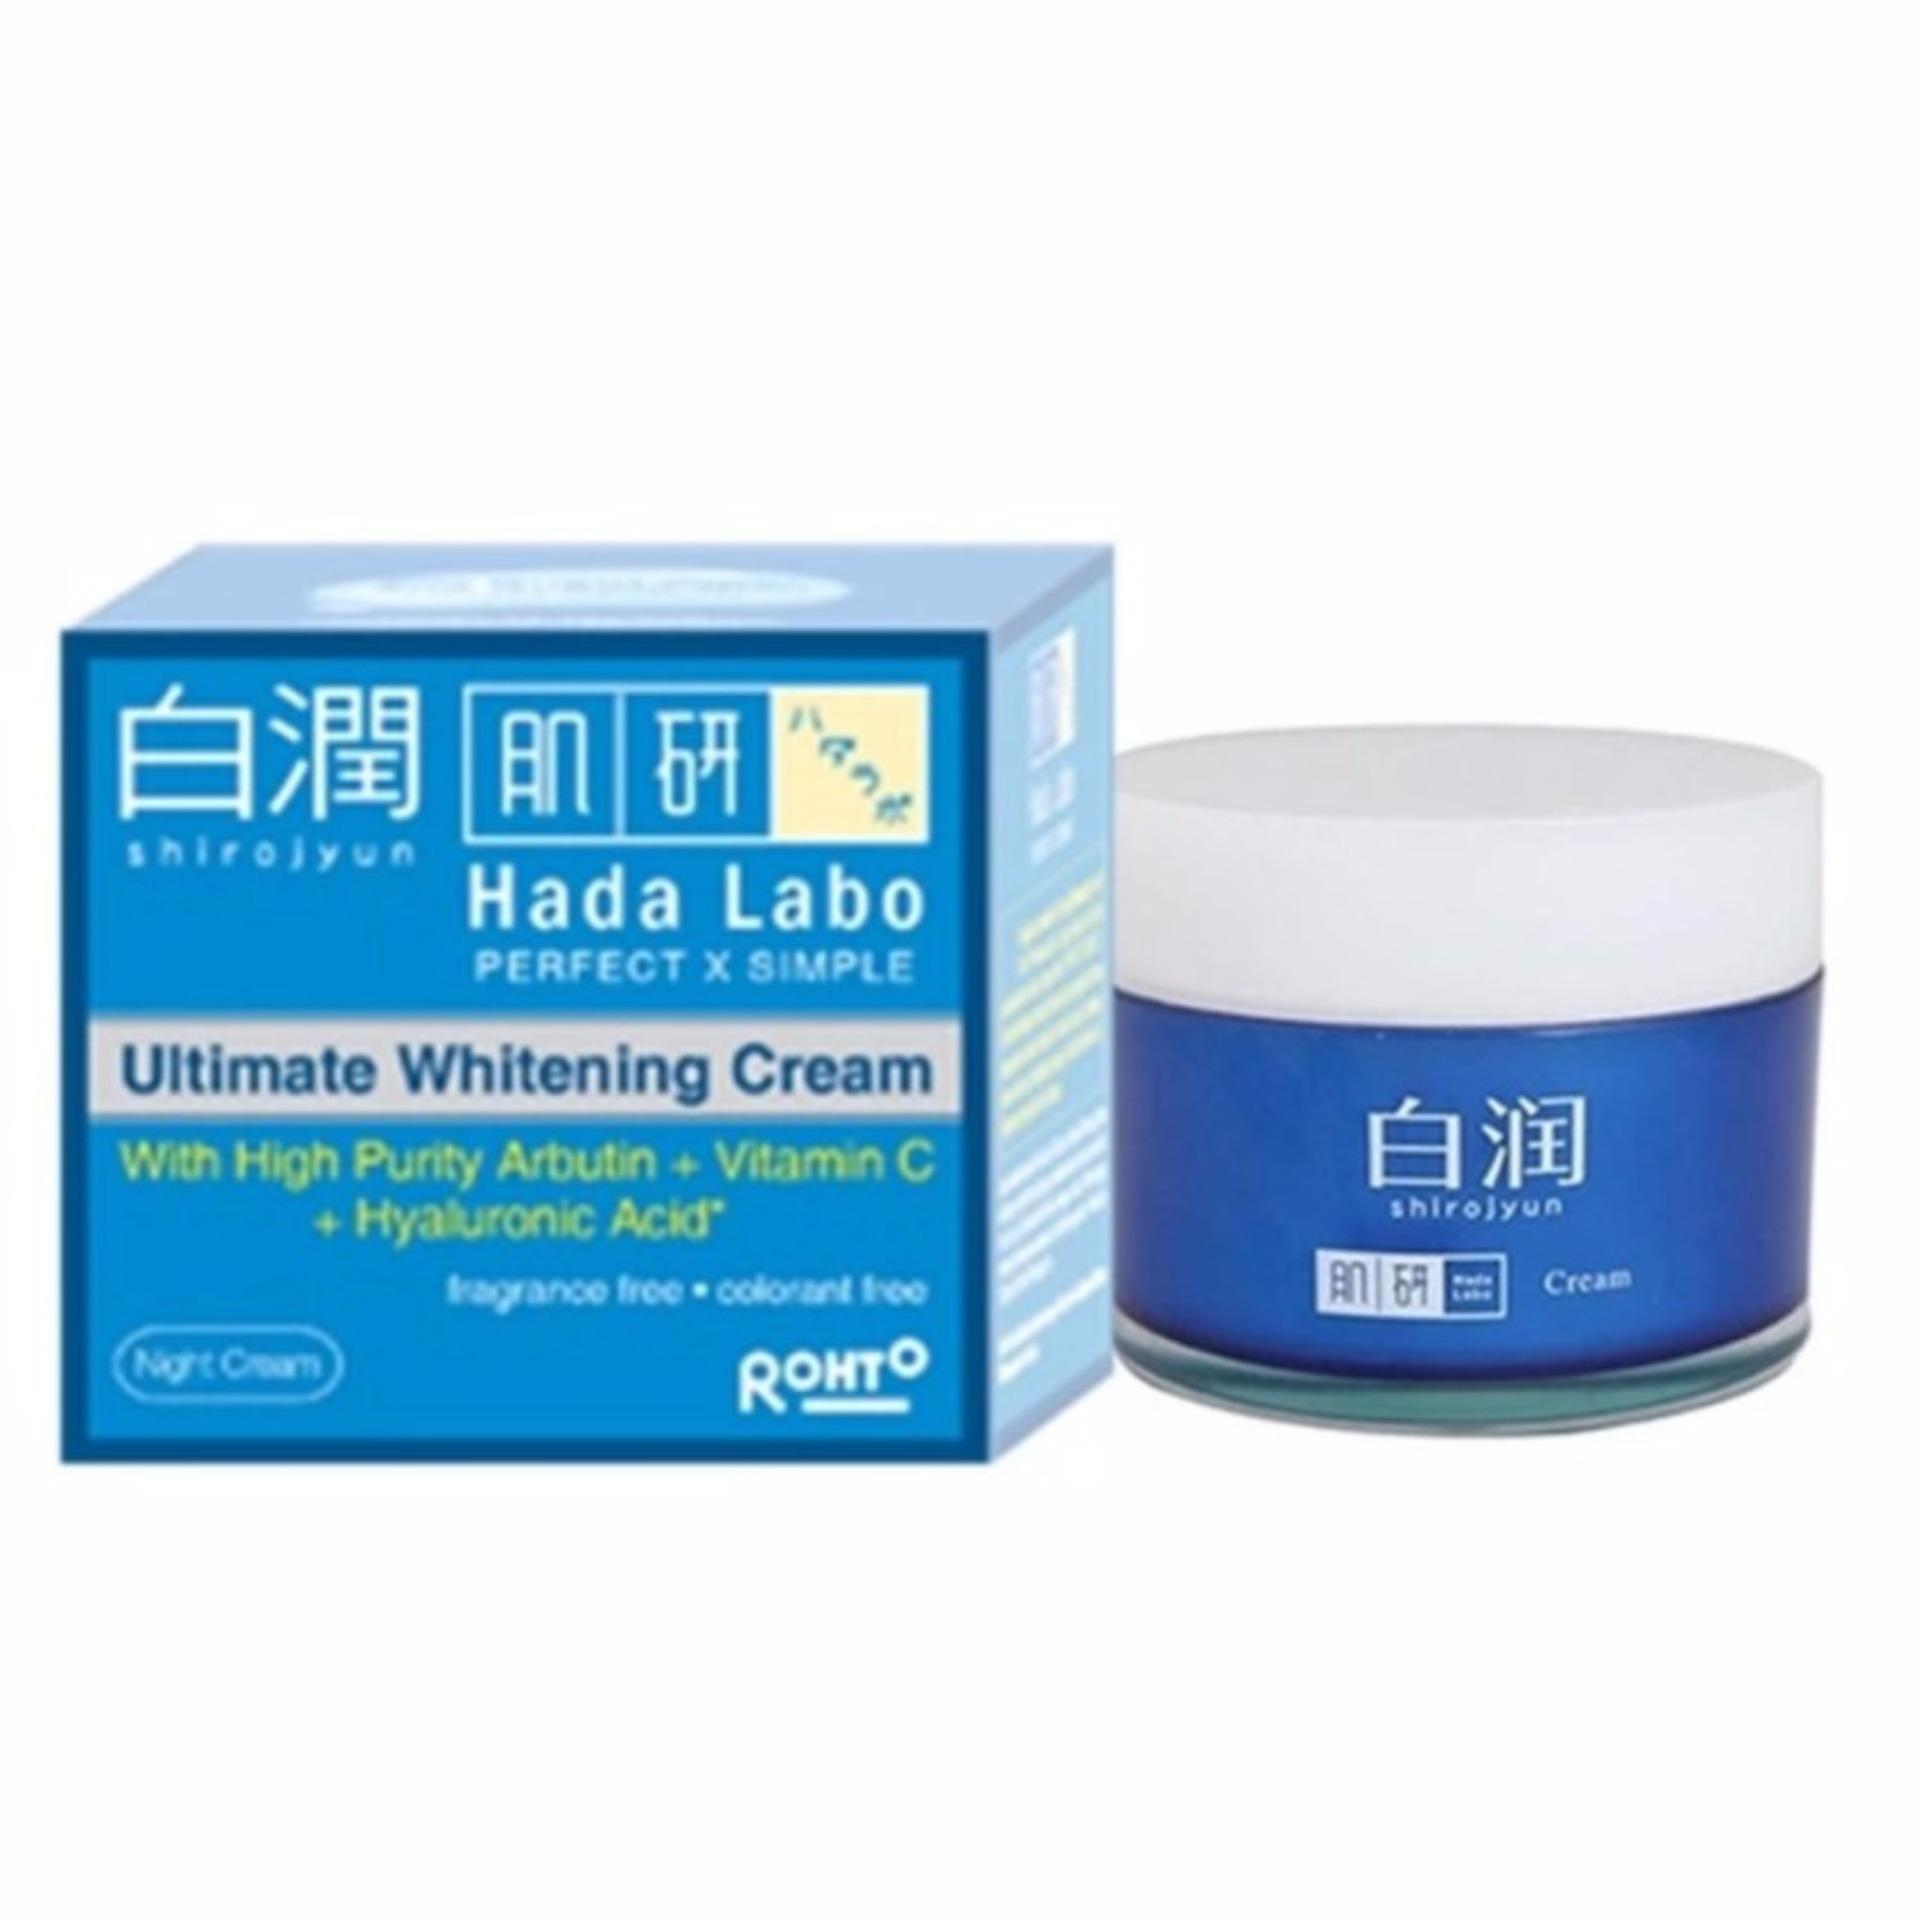 Review Hada Labo Shirojyun Ultimate Whitening Night Cream 40G Di Jawa Barat